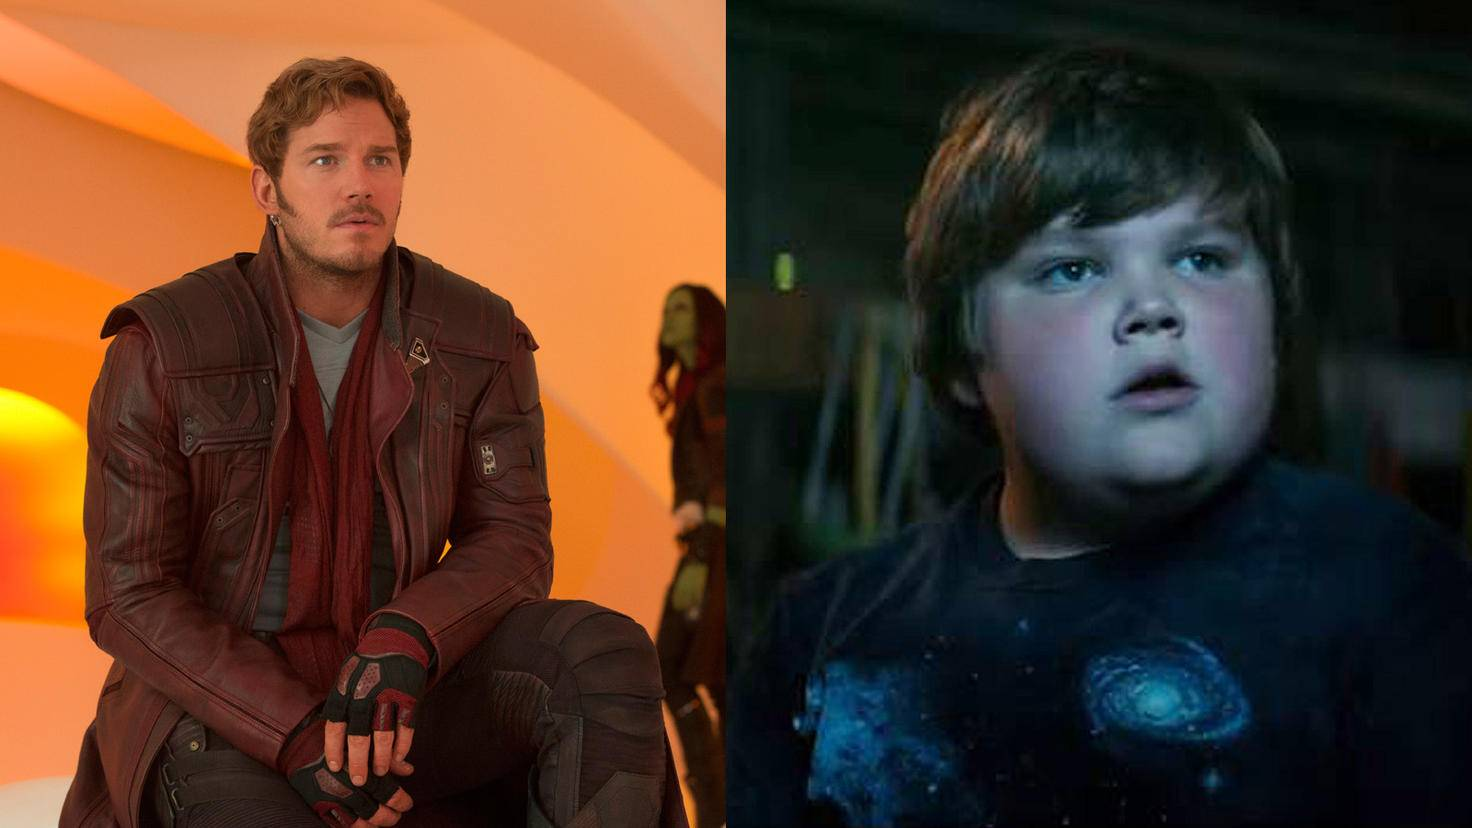 Guardians of the Galaxy 2-Star Lord-Chris Pratt-Marvel Studios-Es-YouTube-Warner bros Pictures-2